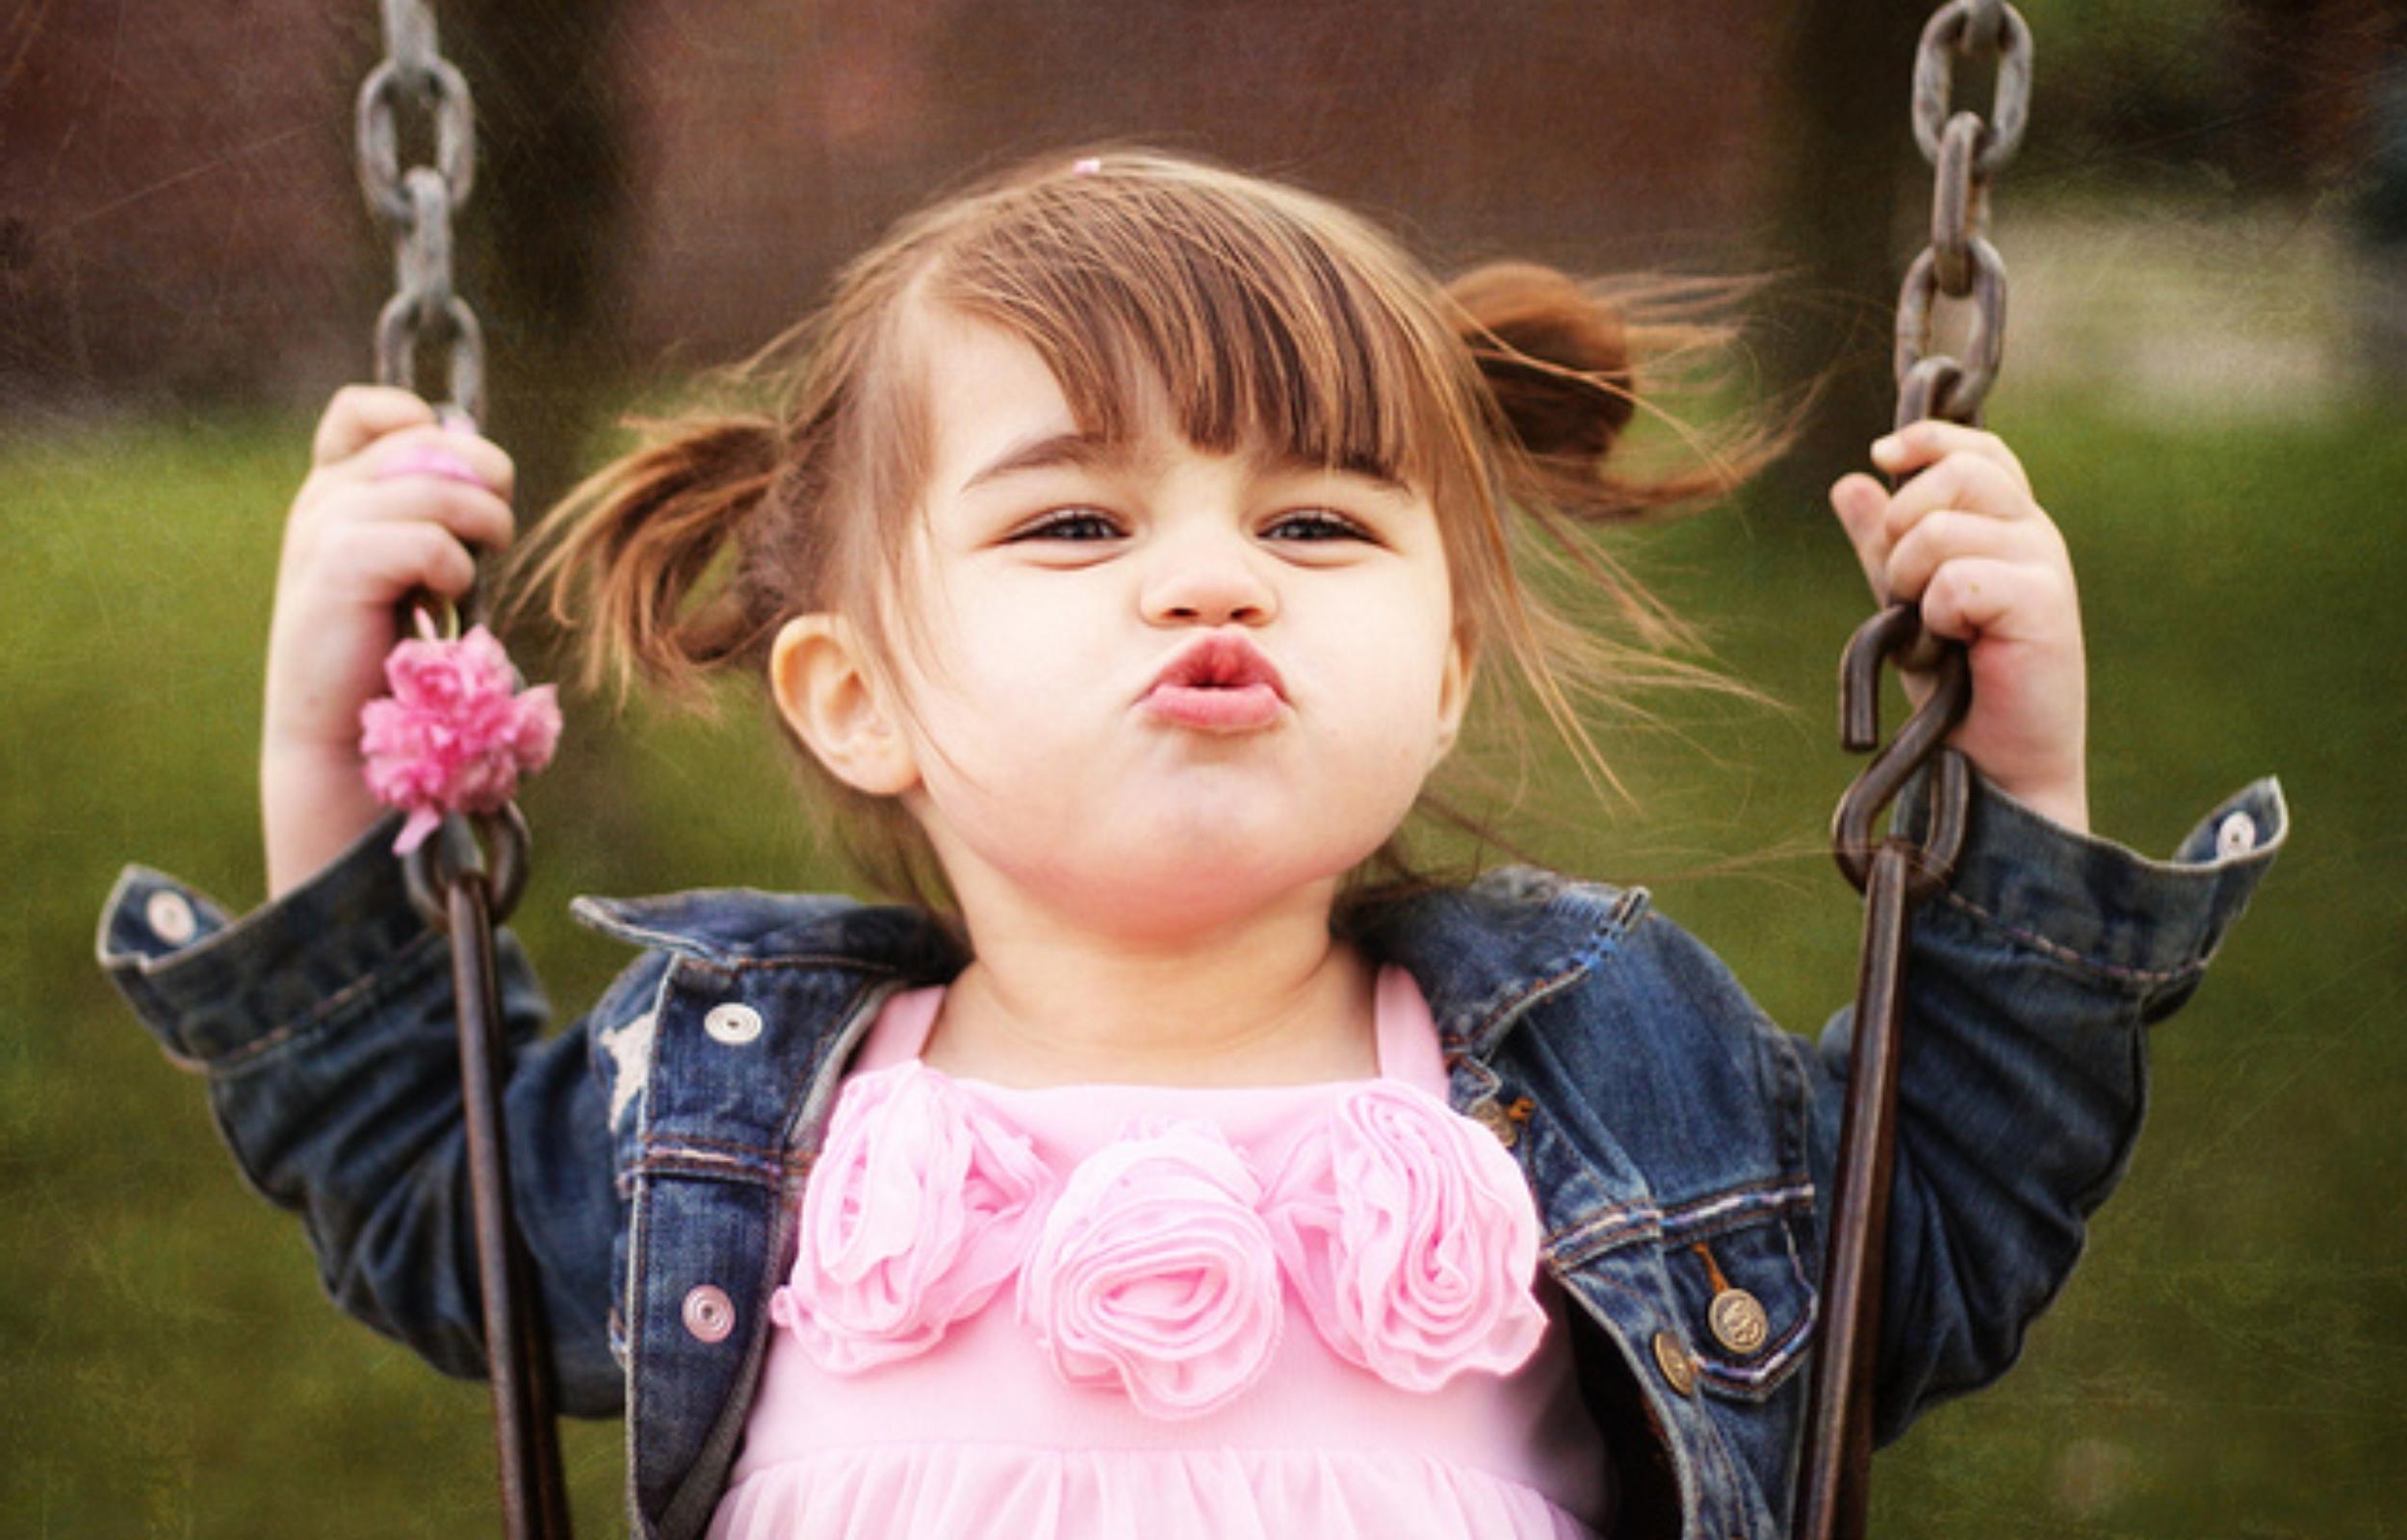 Wallpaper download baby girl - Cute Baby Girl Wallpaper Hd 41bd170y Yoanu Com